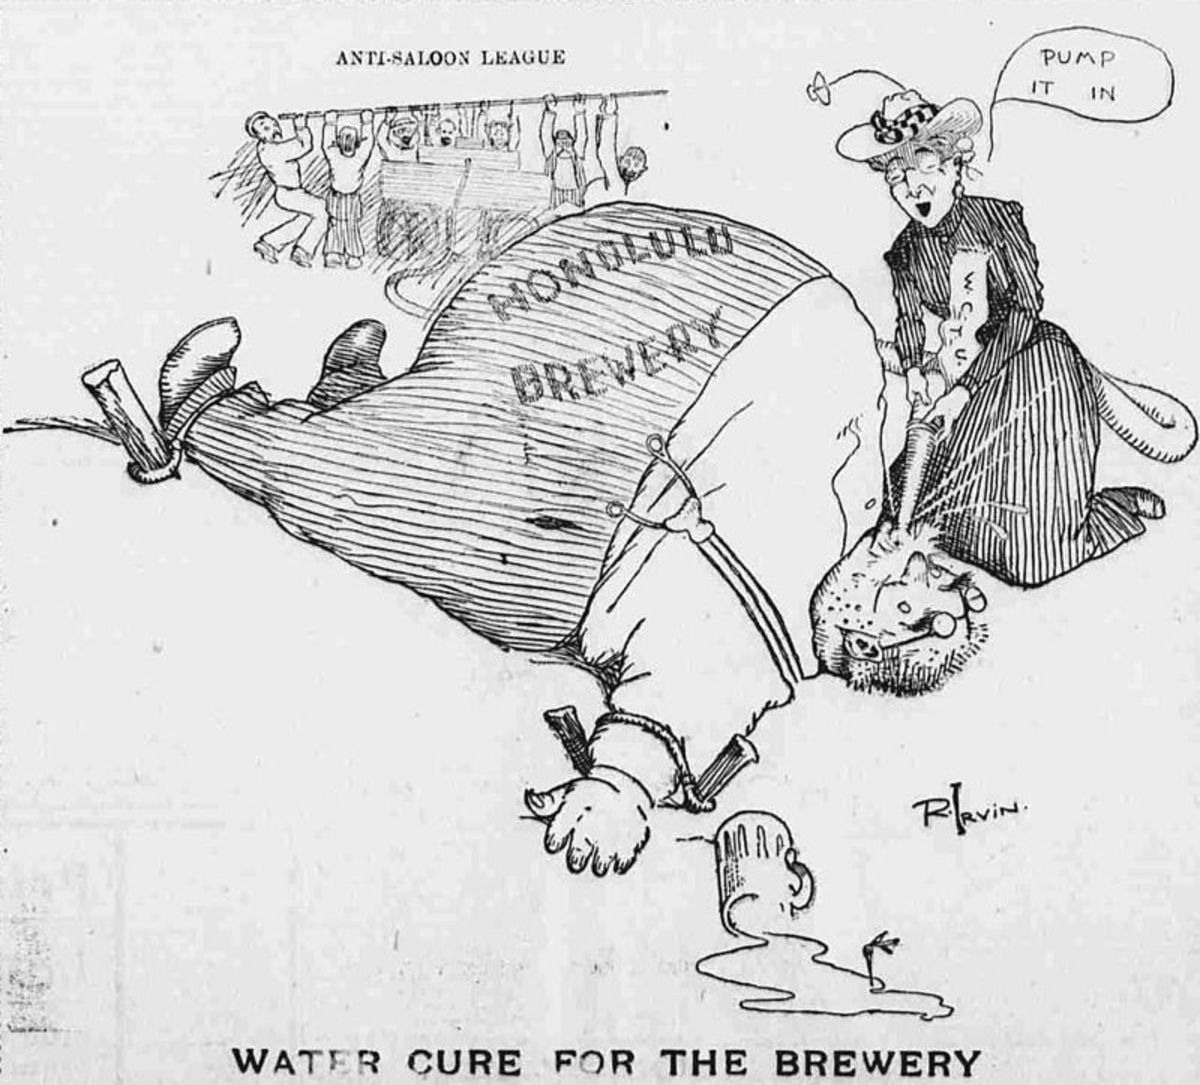 Illustration from Hawaiian Gazette about anti Saloon League.